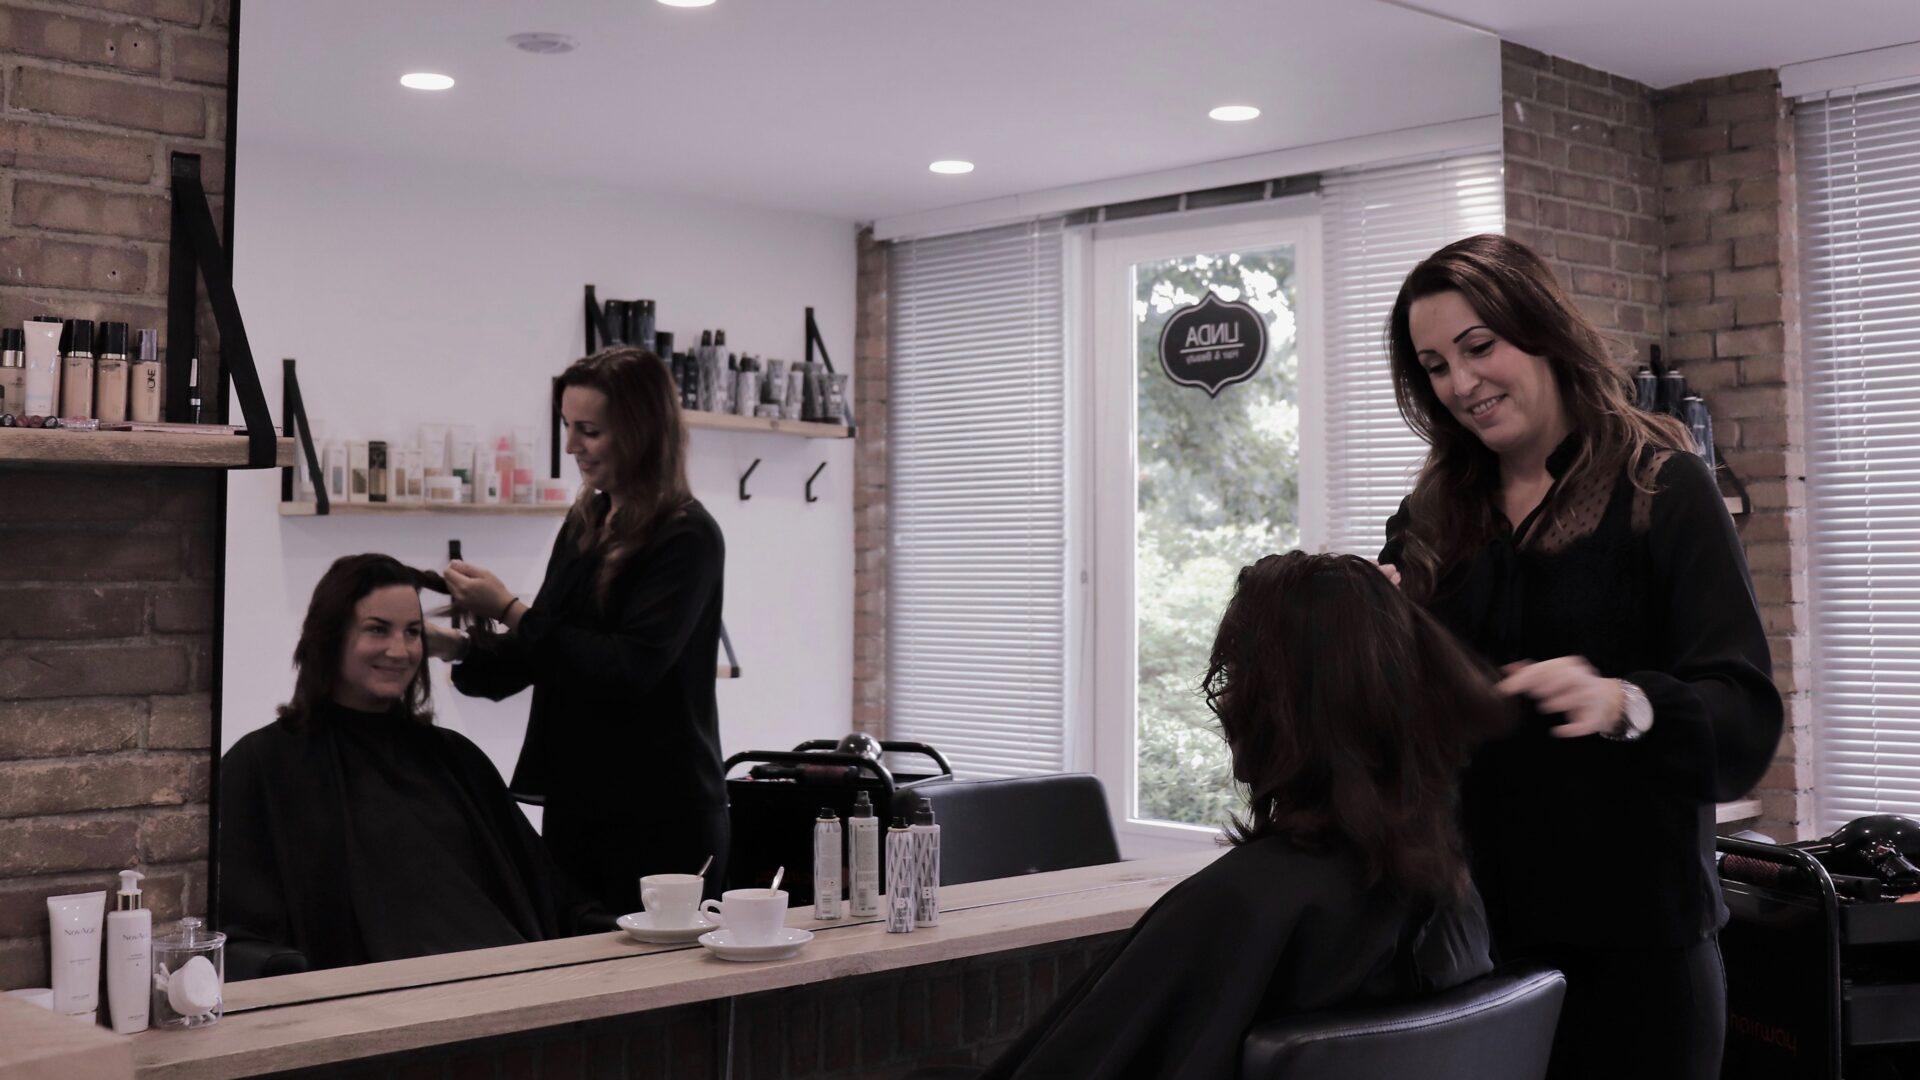 Linda Hair and Beauty